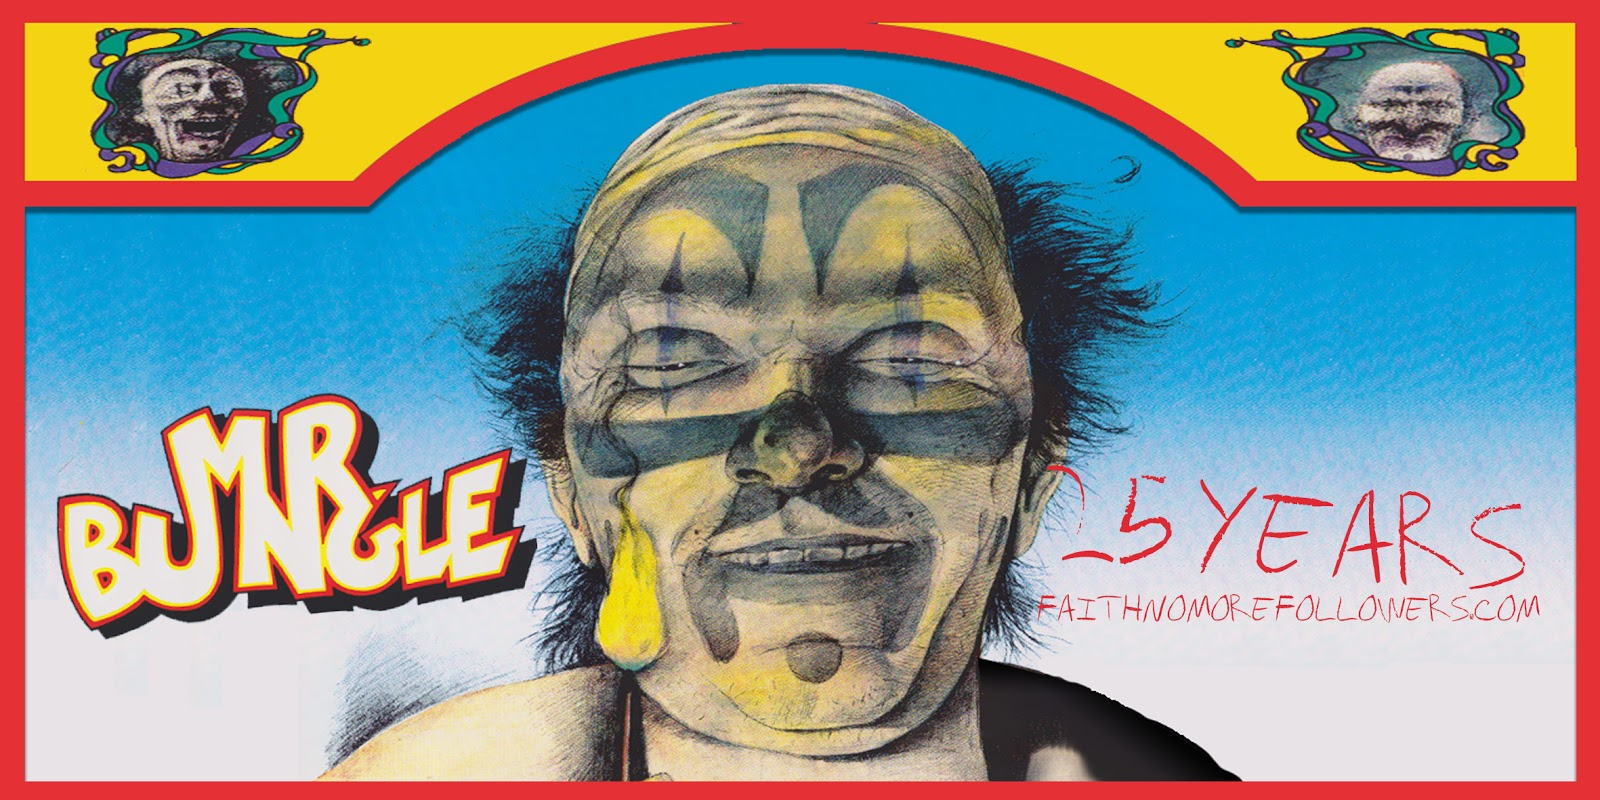 Mr Bungle 25 Years